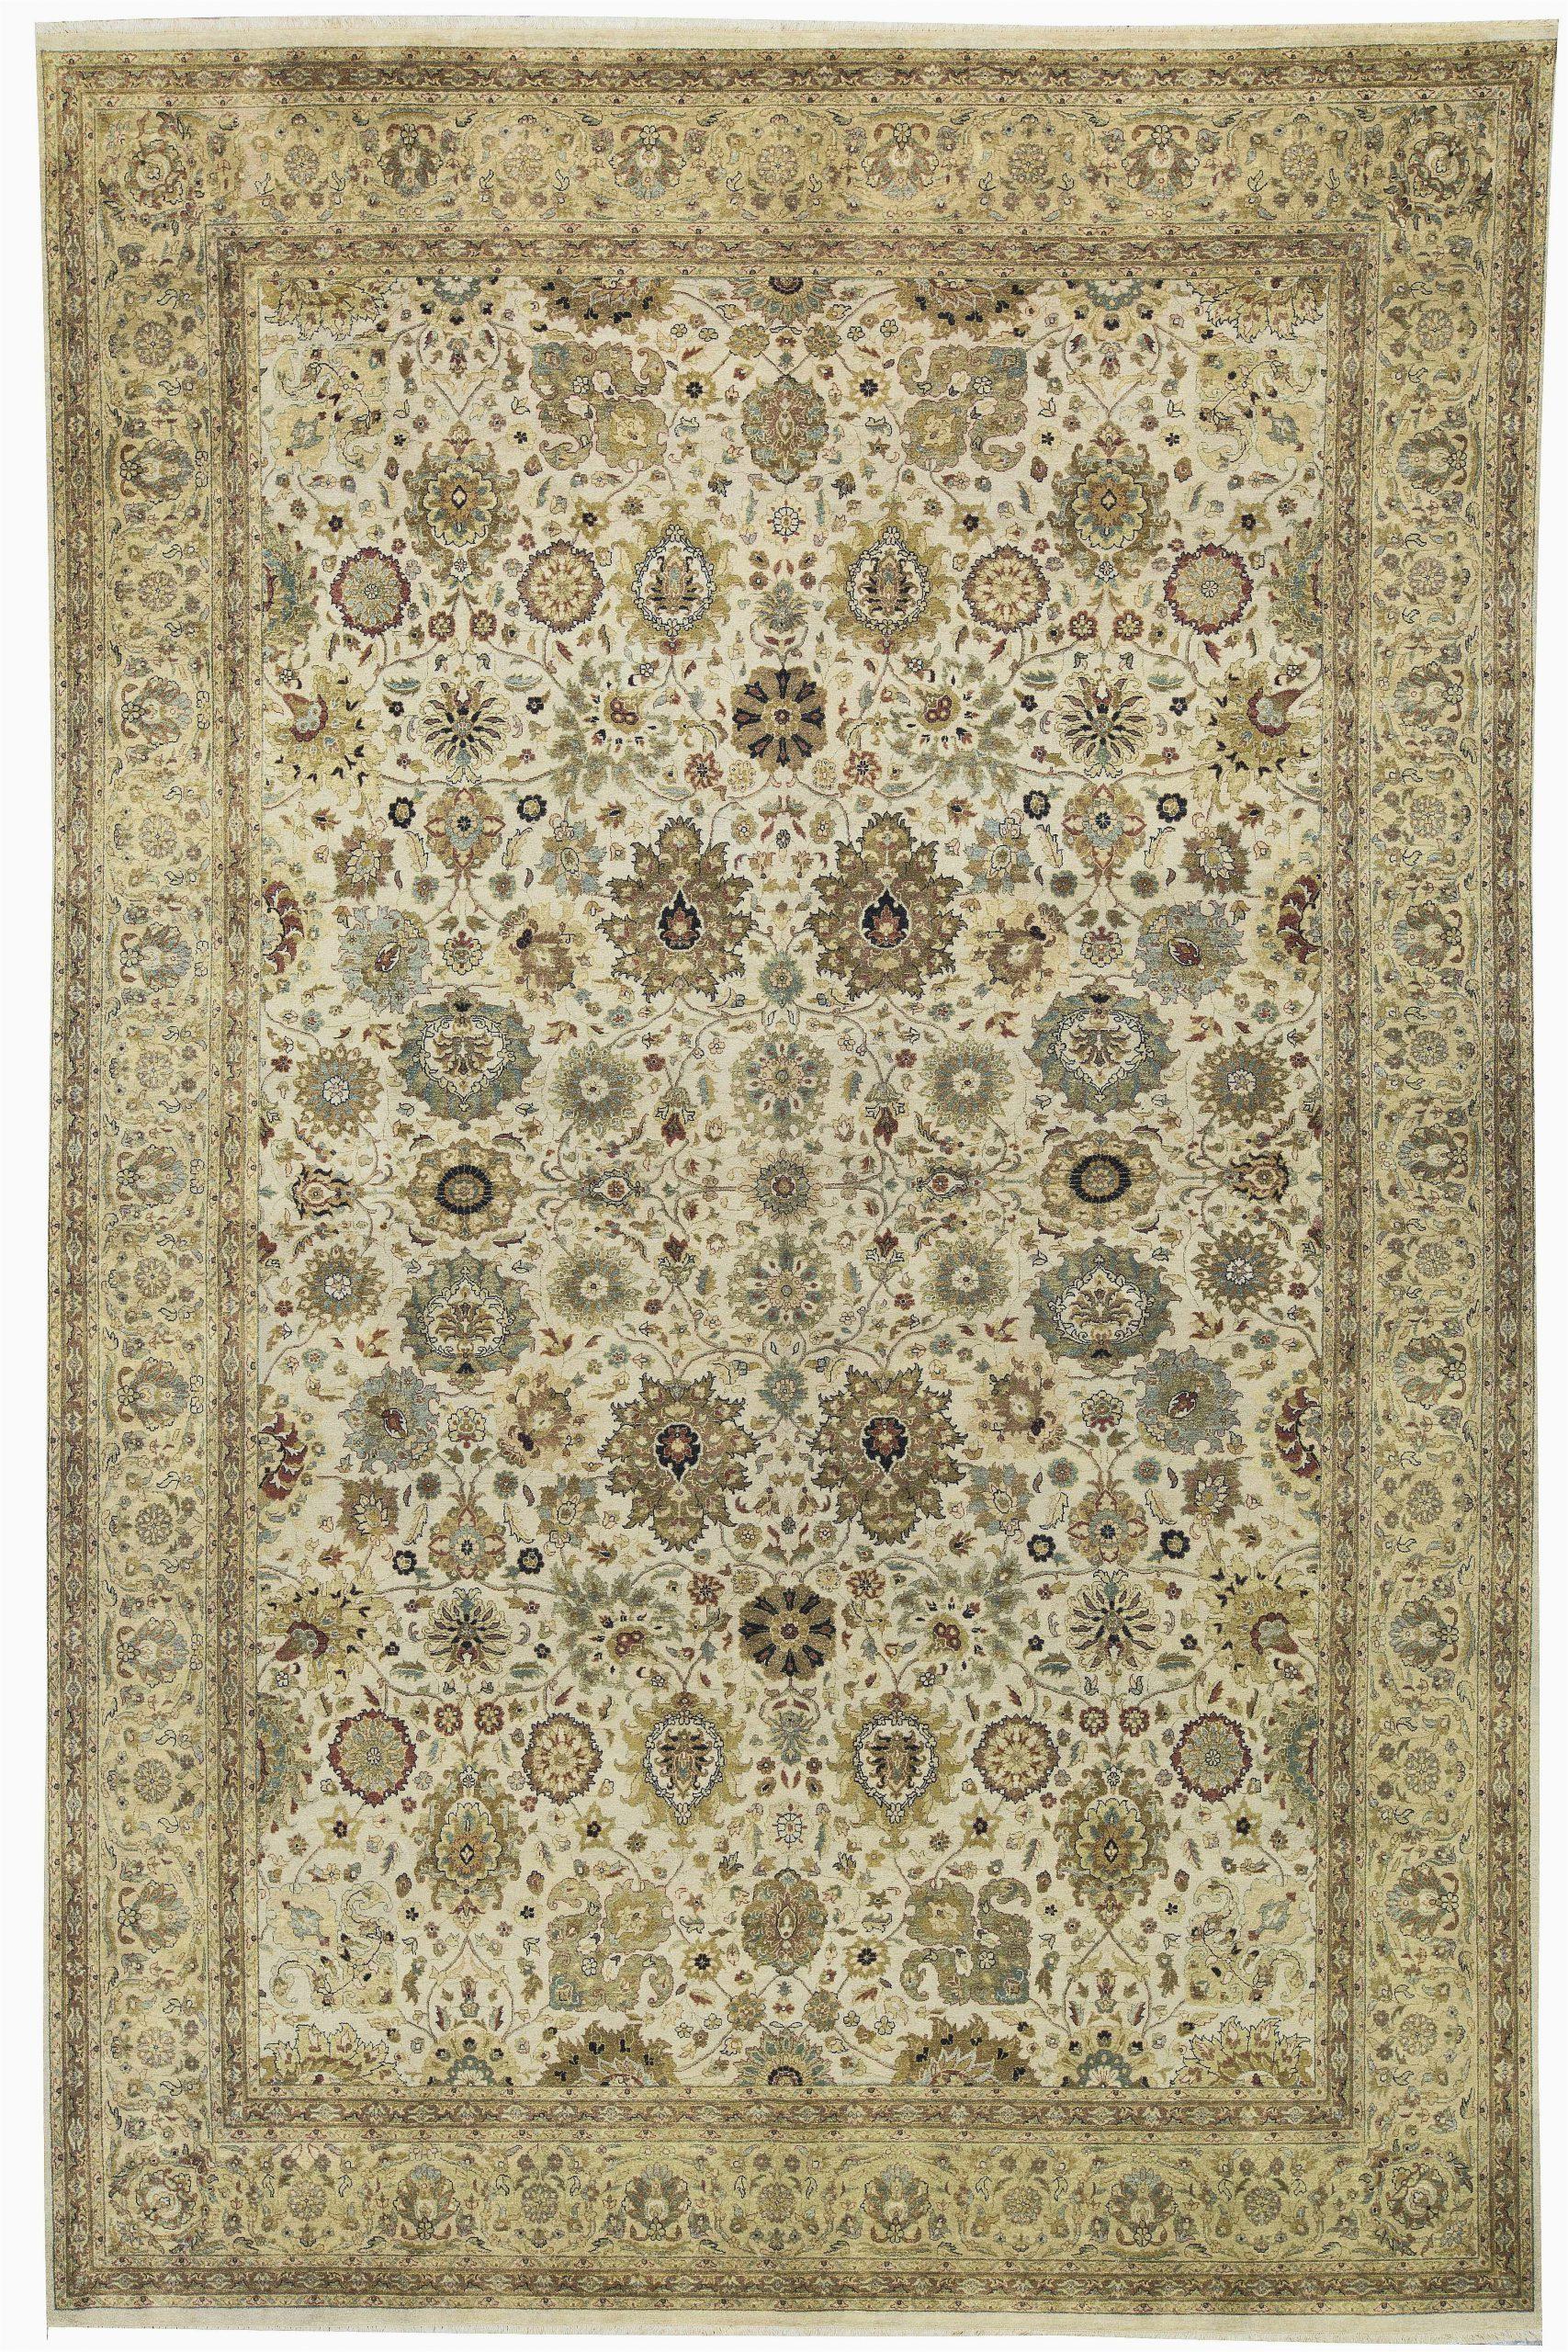 bokara rug co inc one of a kind moghal royal hand knotted beige 1110 x 183 wool area rug abhd2756